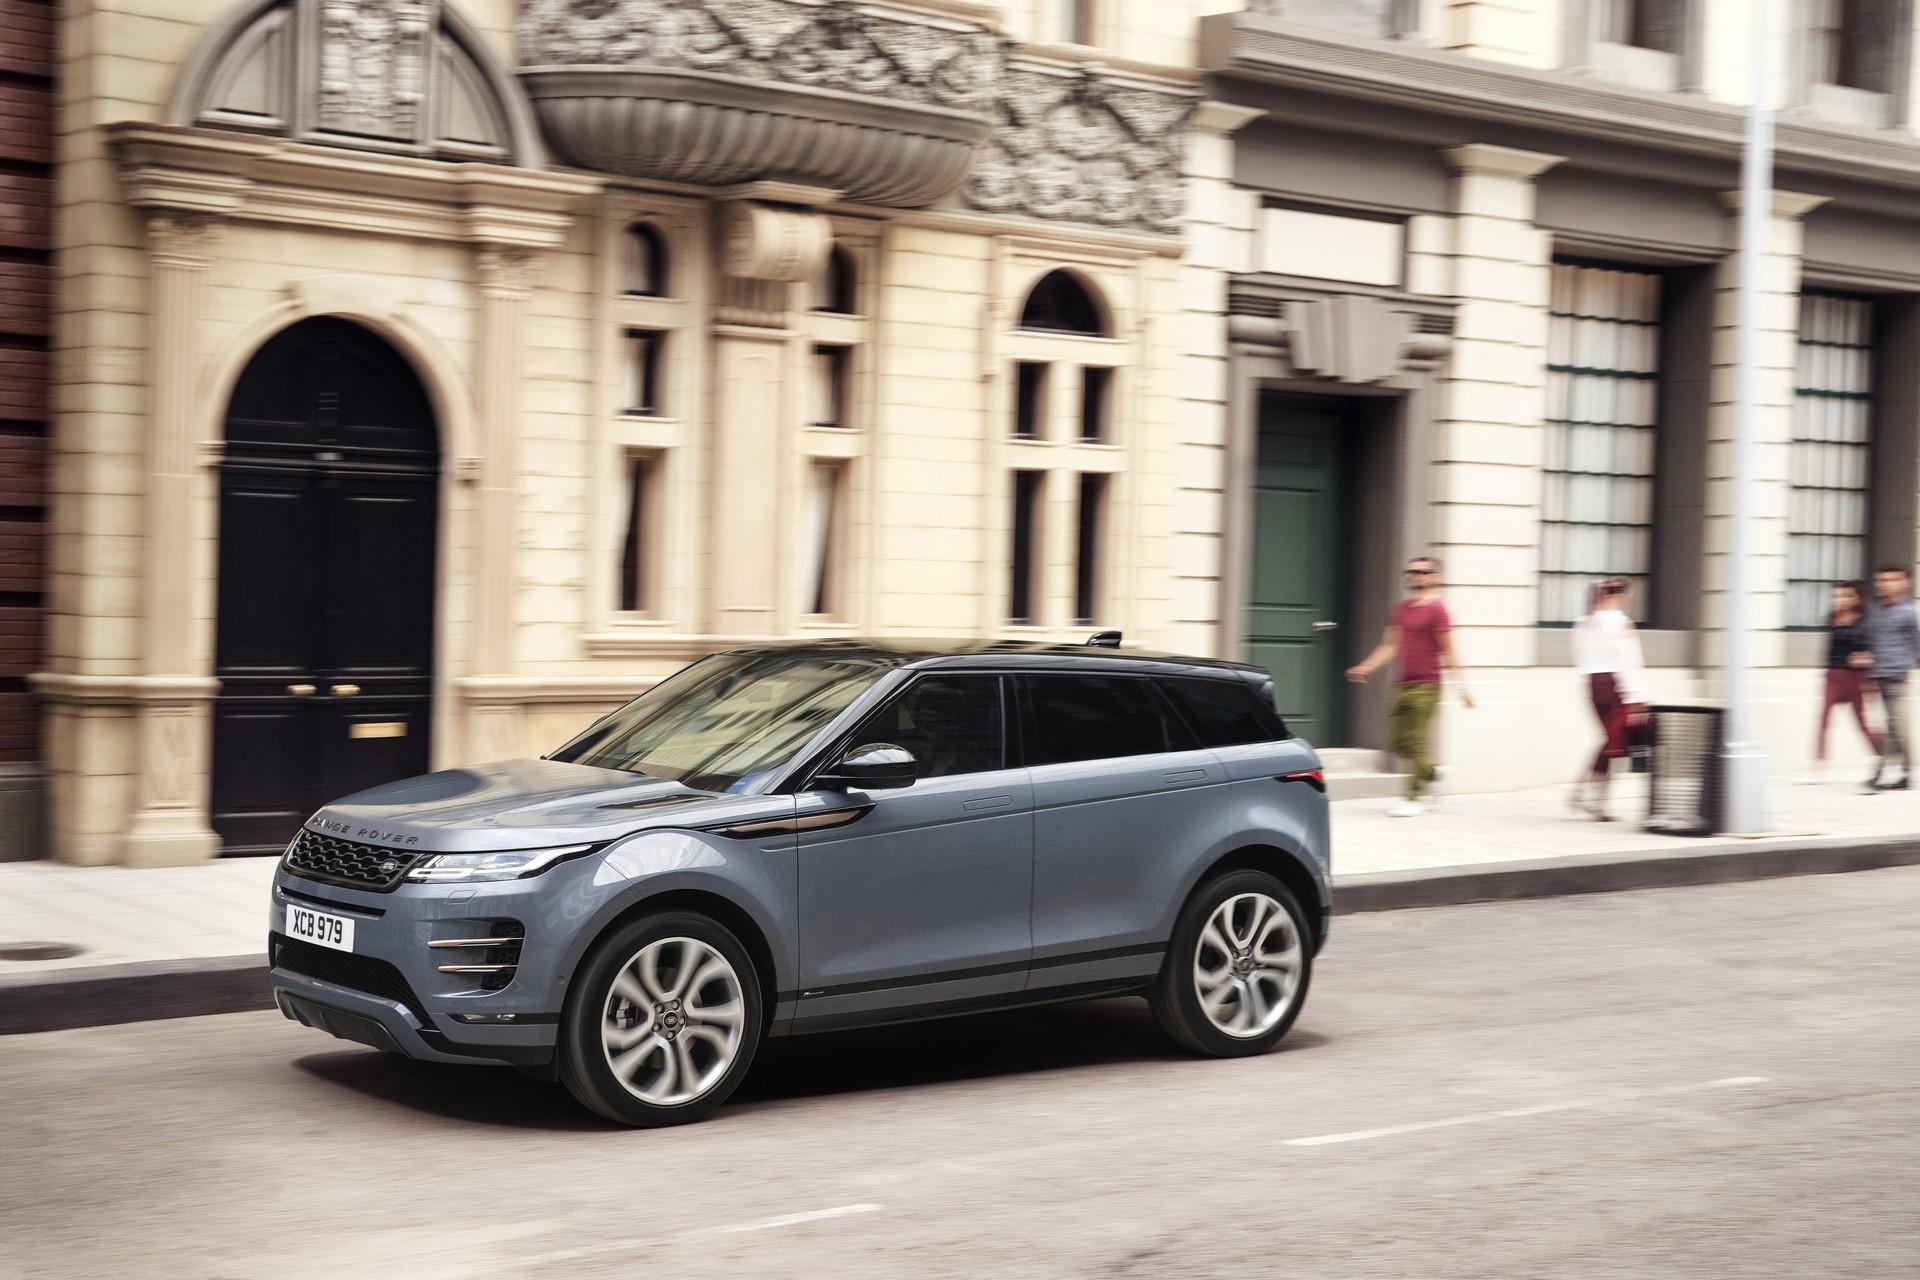 Range Rover Evoque 2019 (42)